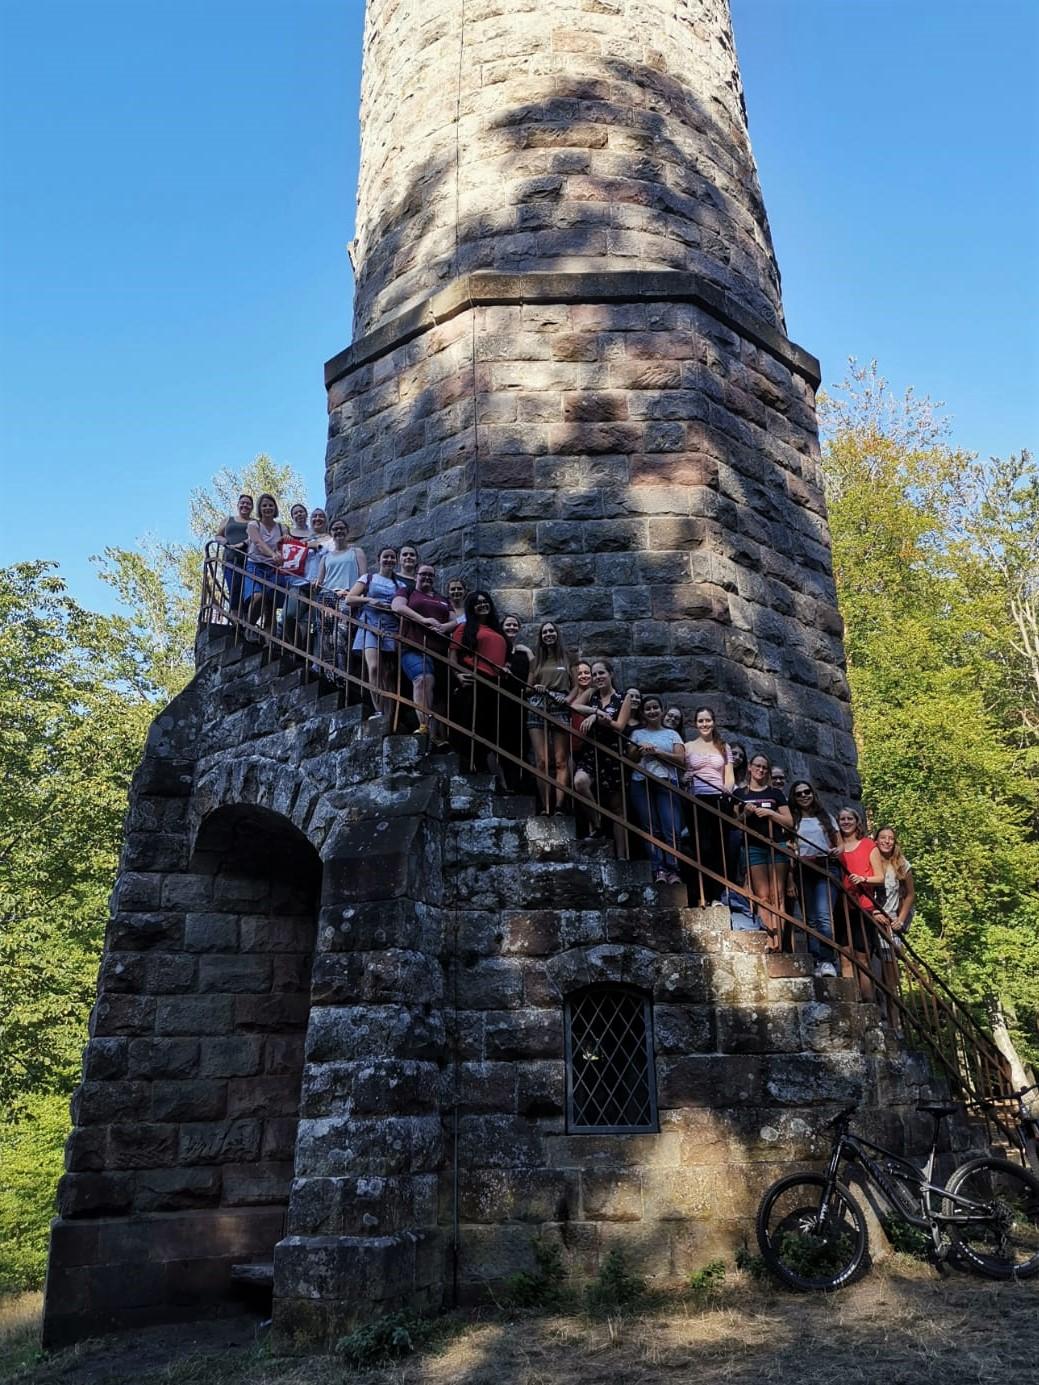 Das Ziel der Wanderung: Der Humbergturm